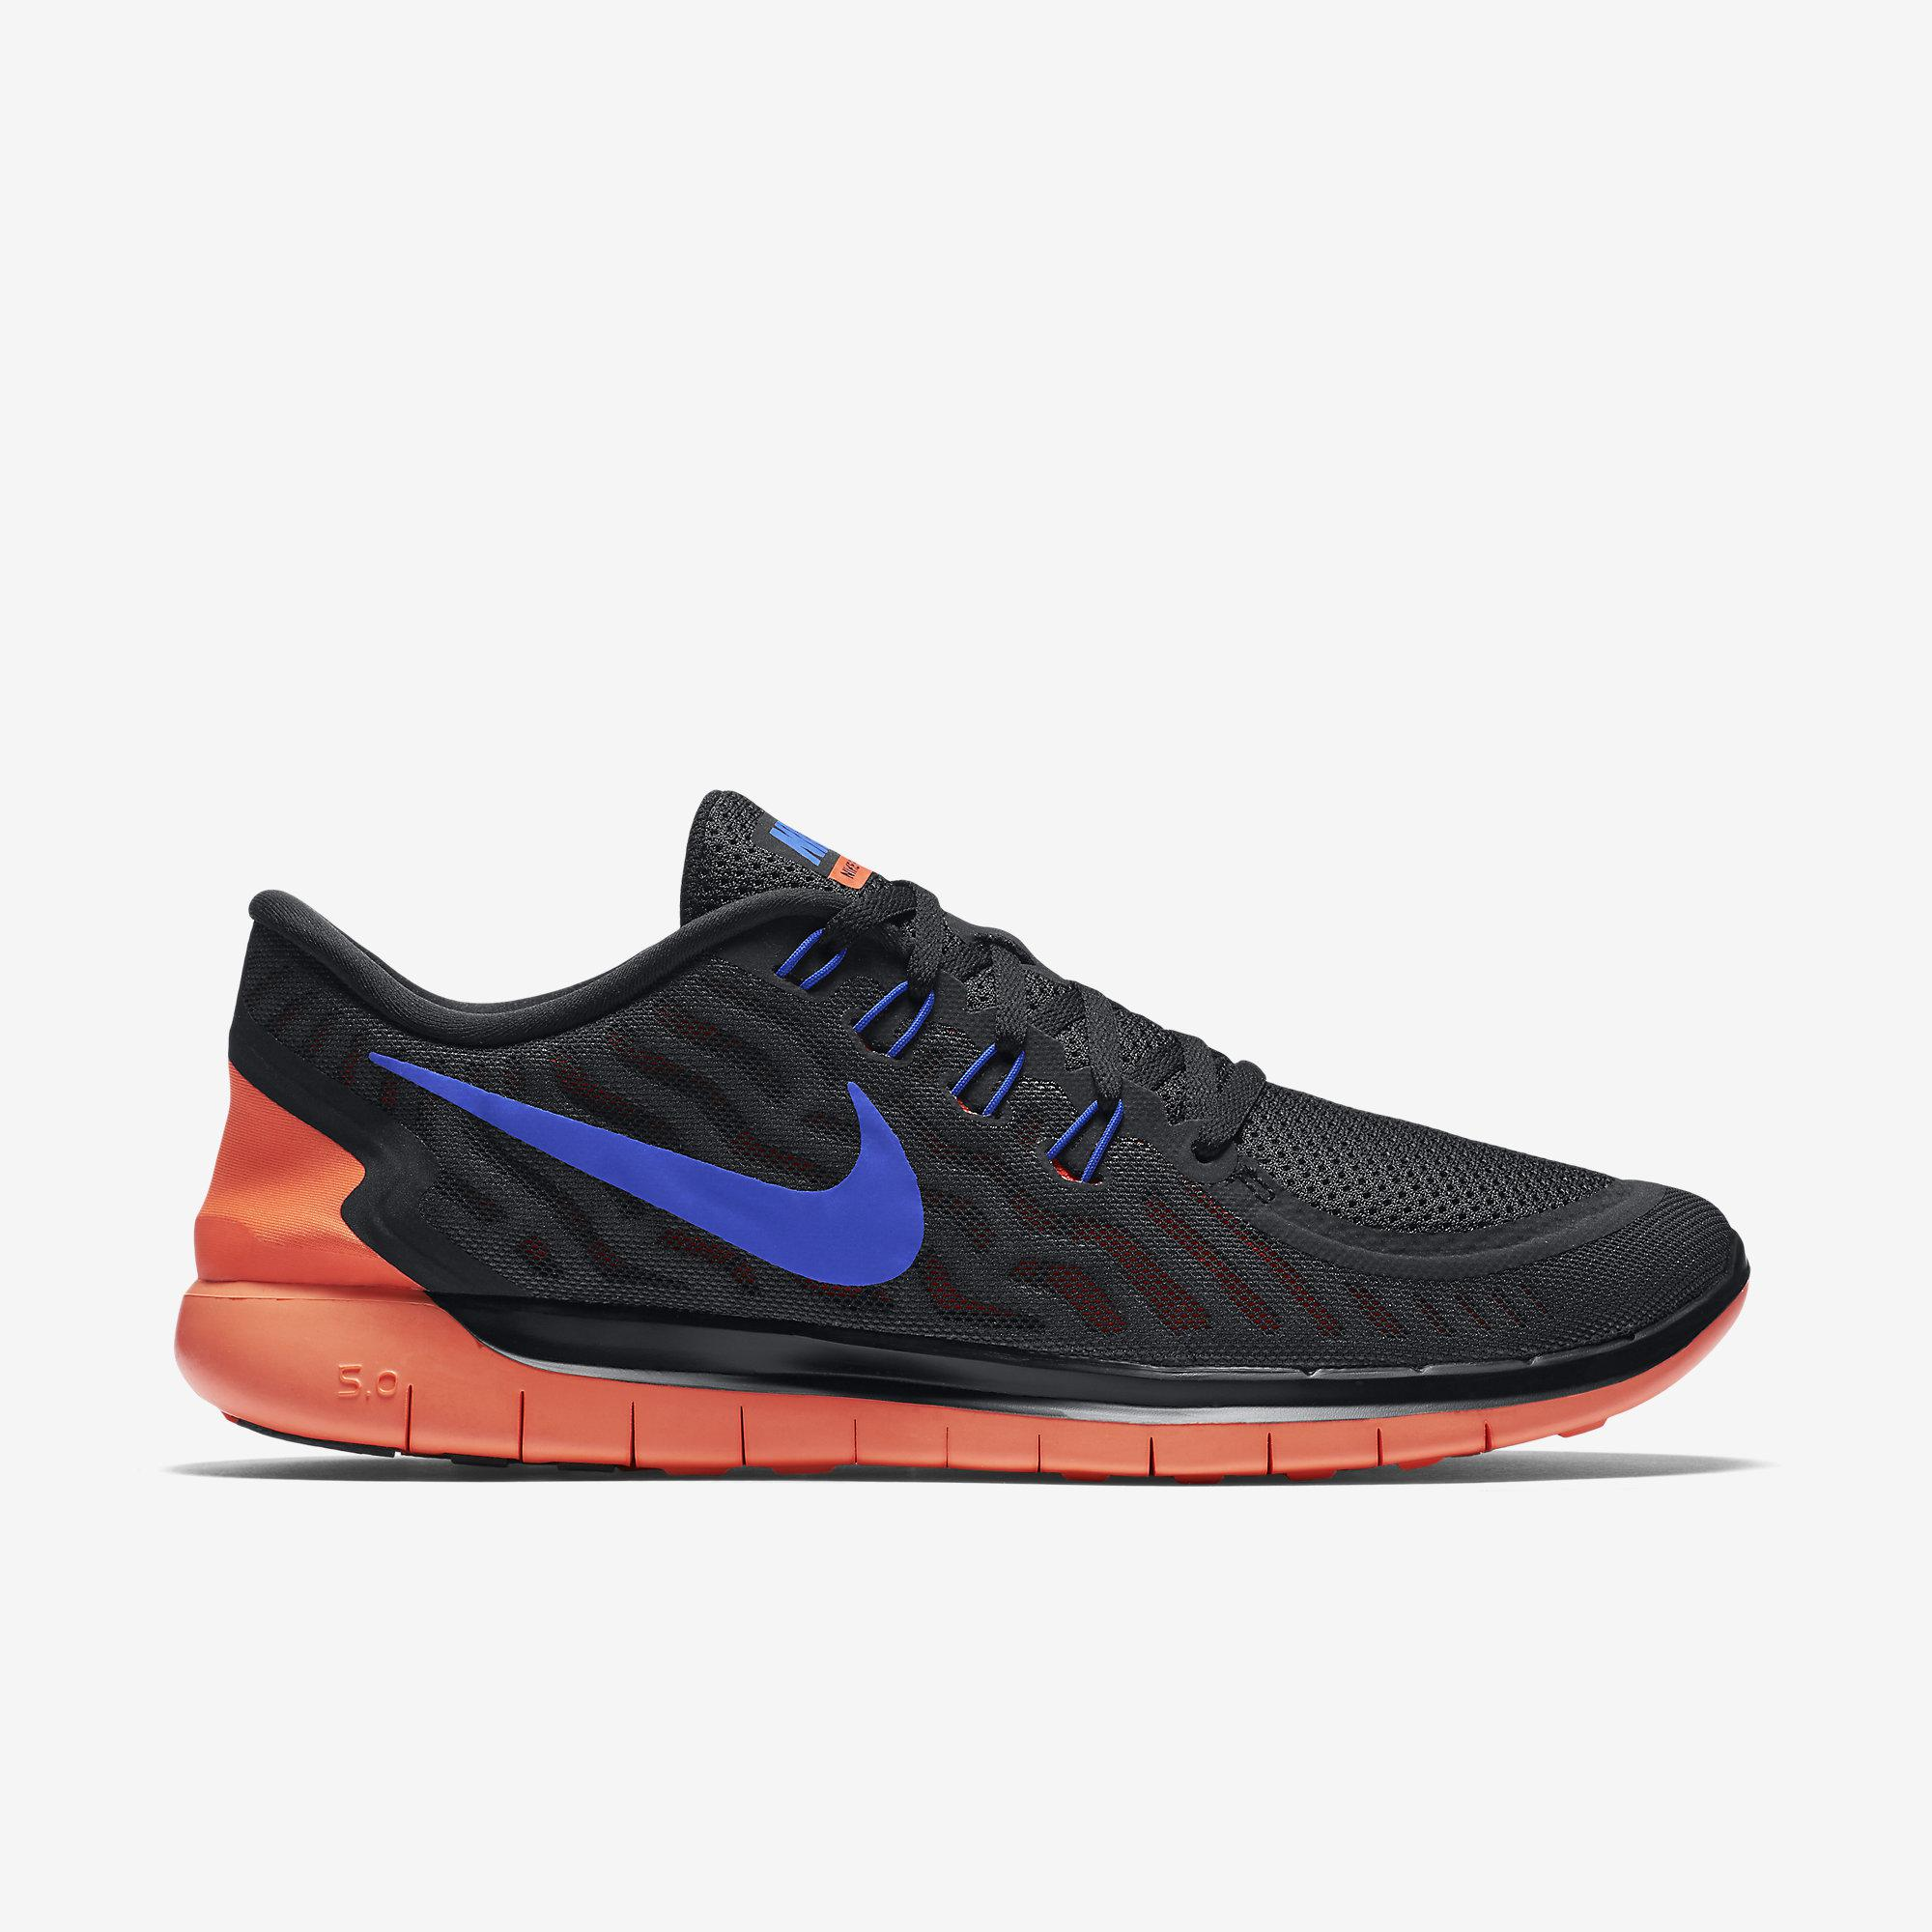 a404a324e5ad Nike Mens Free 5.0 Running Shoes - Black Blue Crimson - Tennisnuts.com